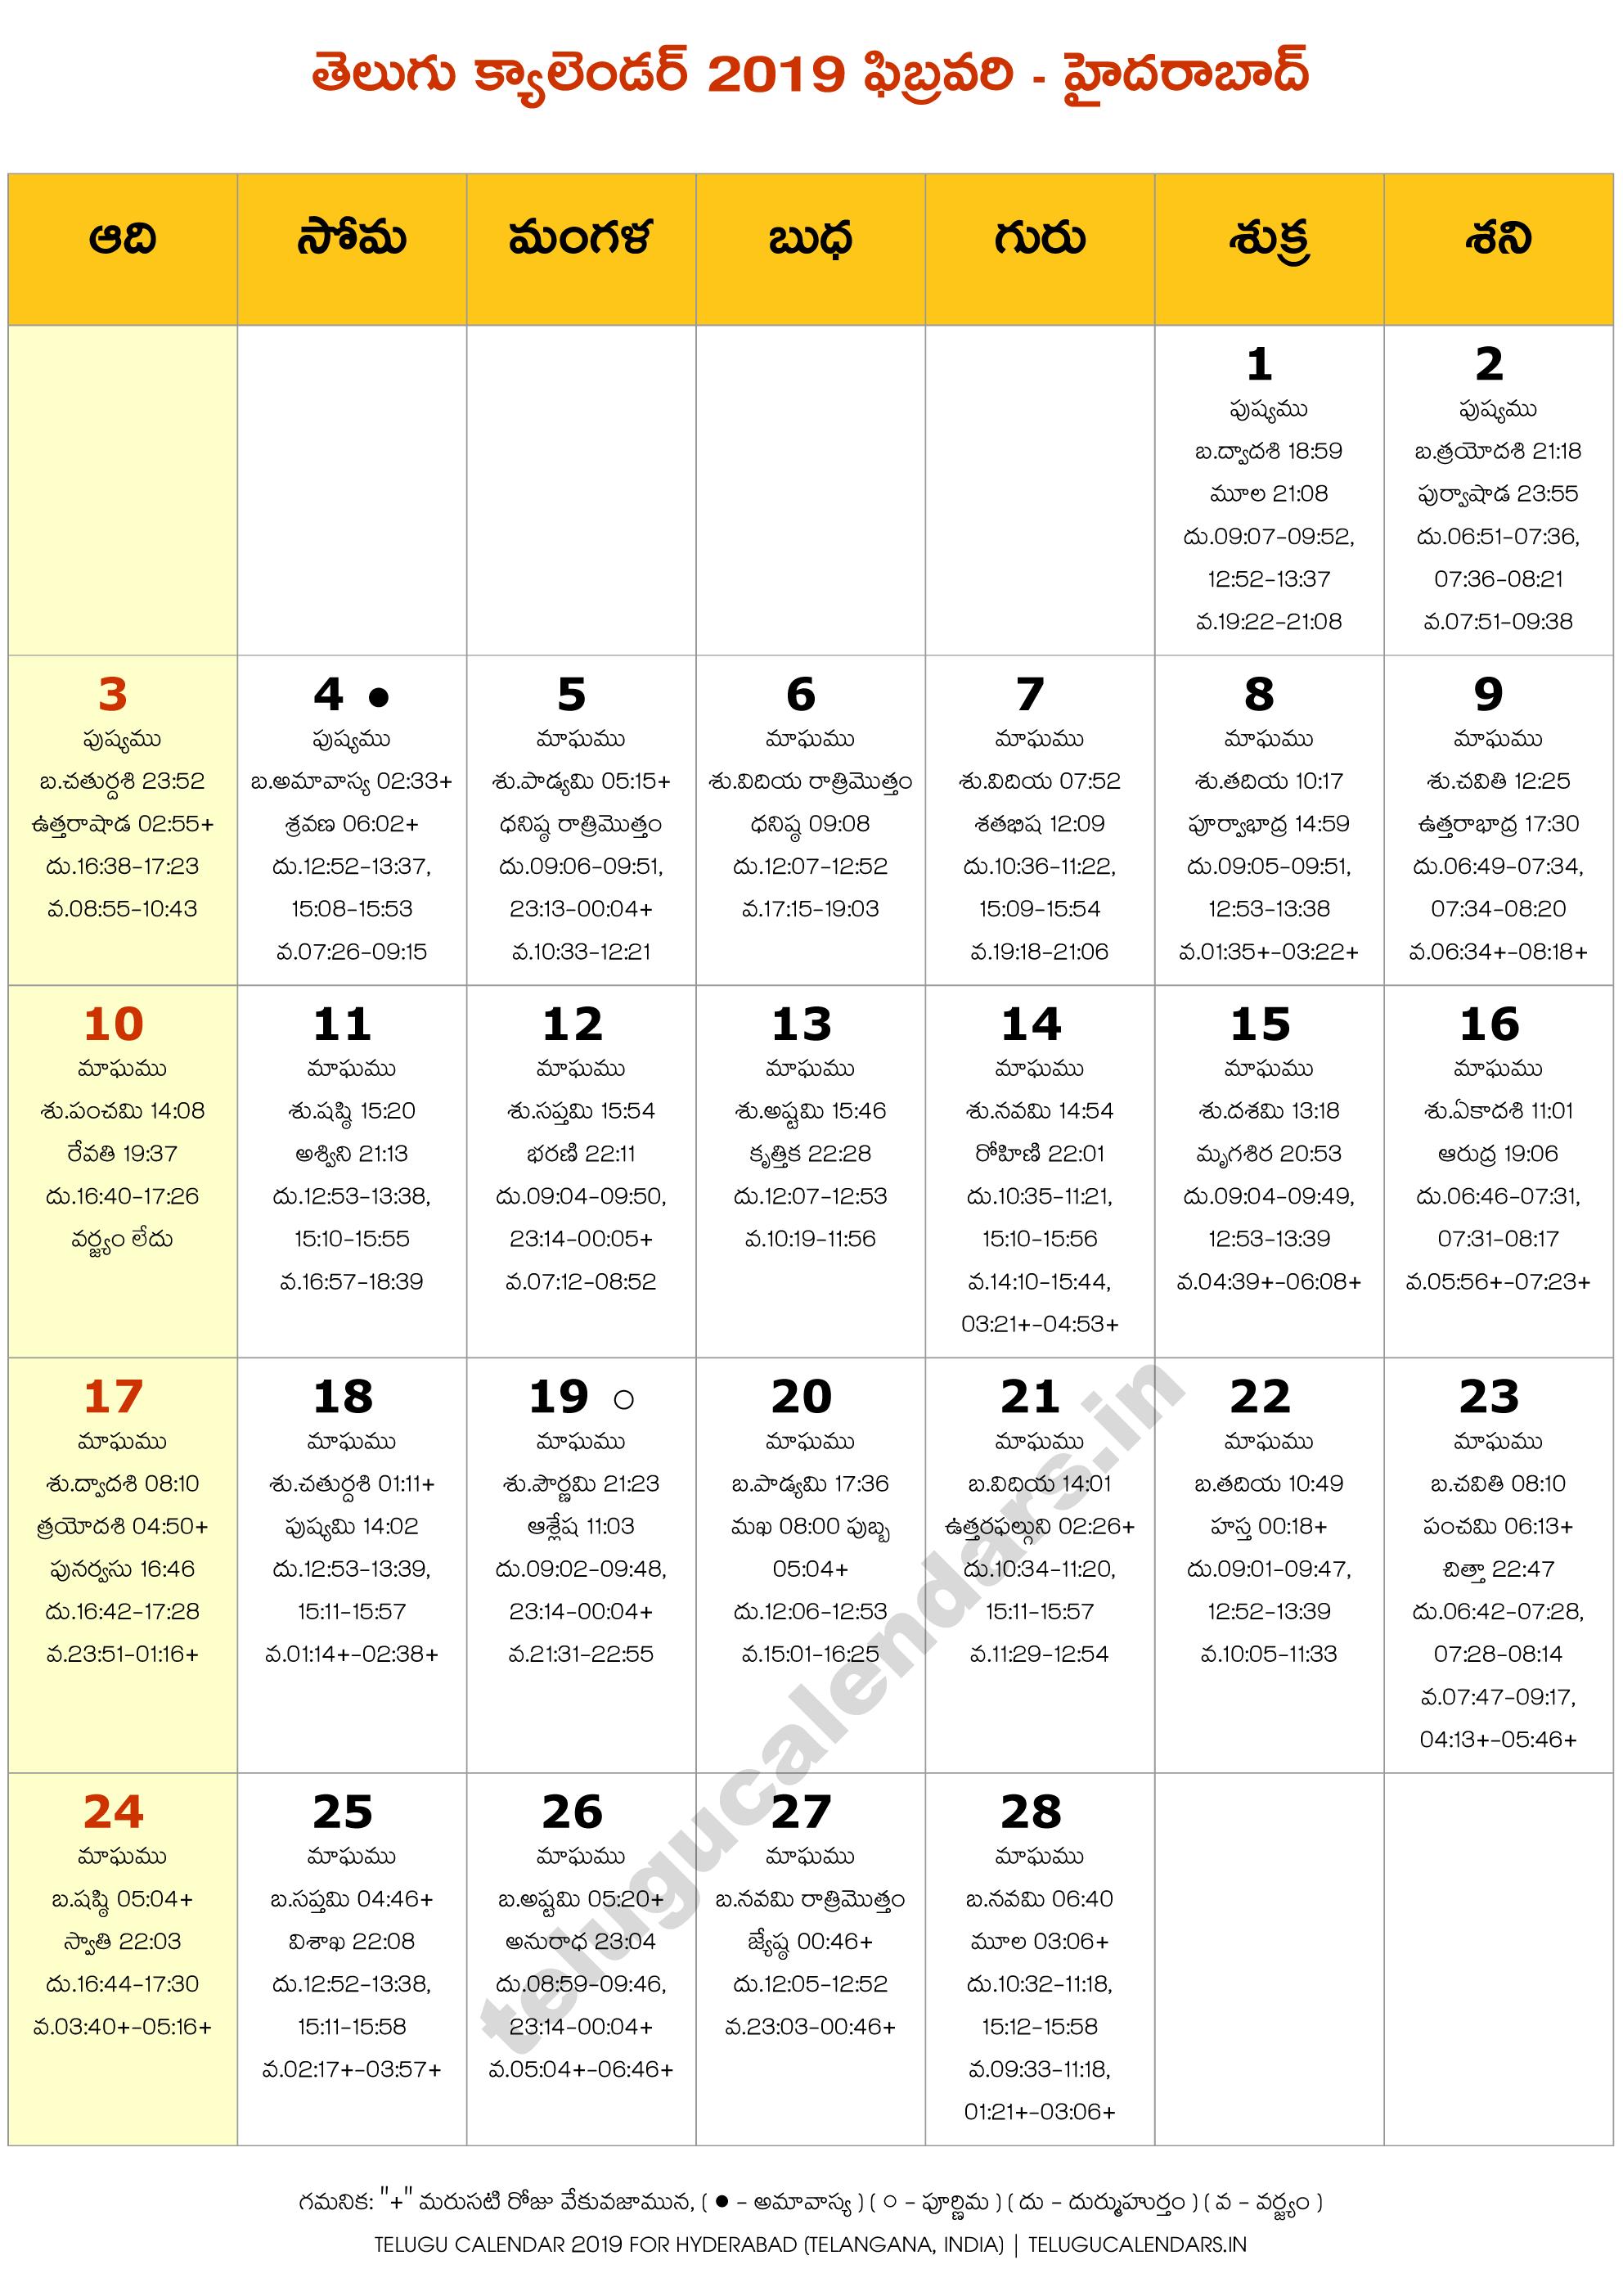 Telugu Telangana Calendar 2019 February Hyderabad 2019 February Telugu Calendar | Telugu Calendars